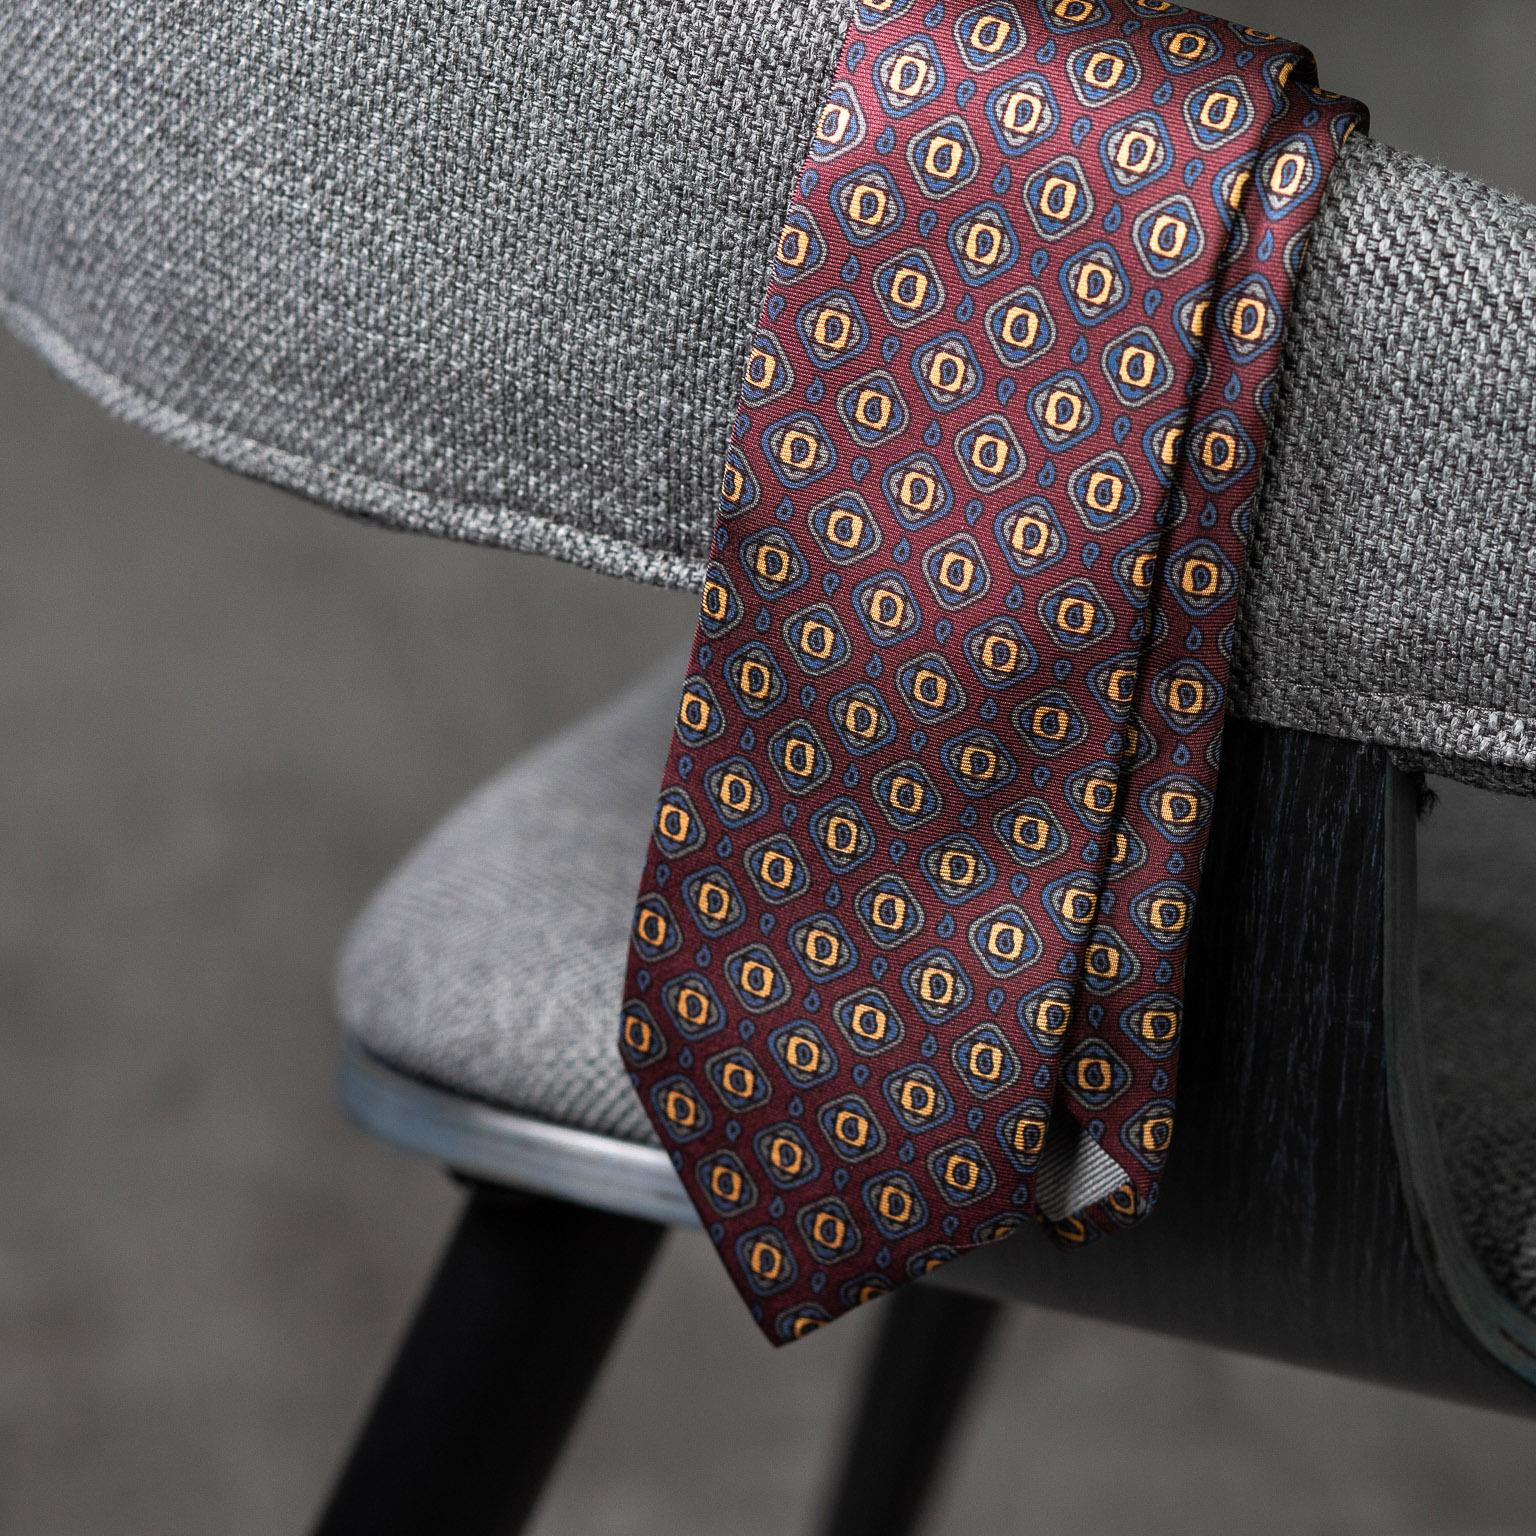 PRINTED-SILK-SEDA-ESTAMPADA-0578-Tie-Initials-Corbata-Iniciales-The-Seelk-3